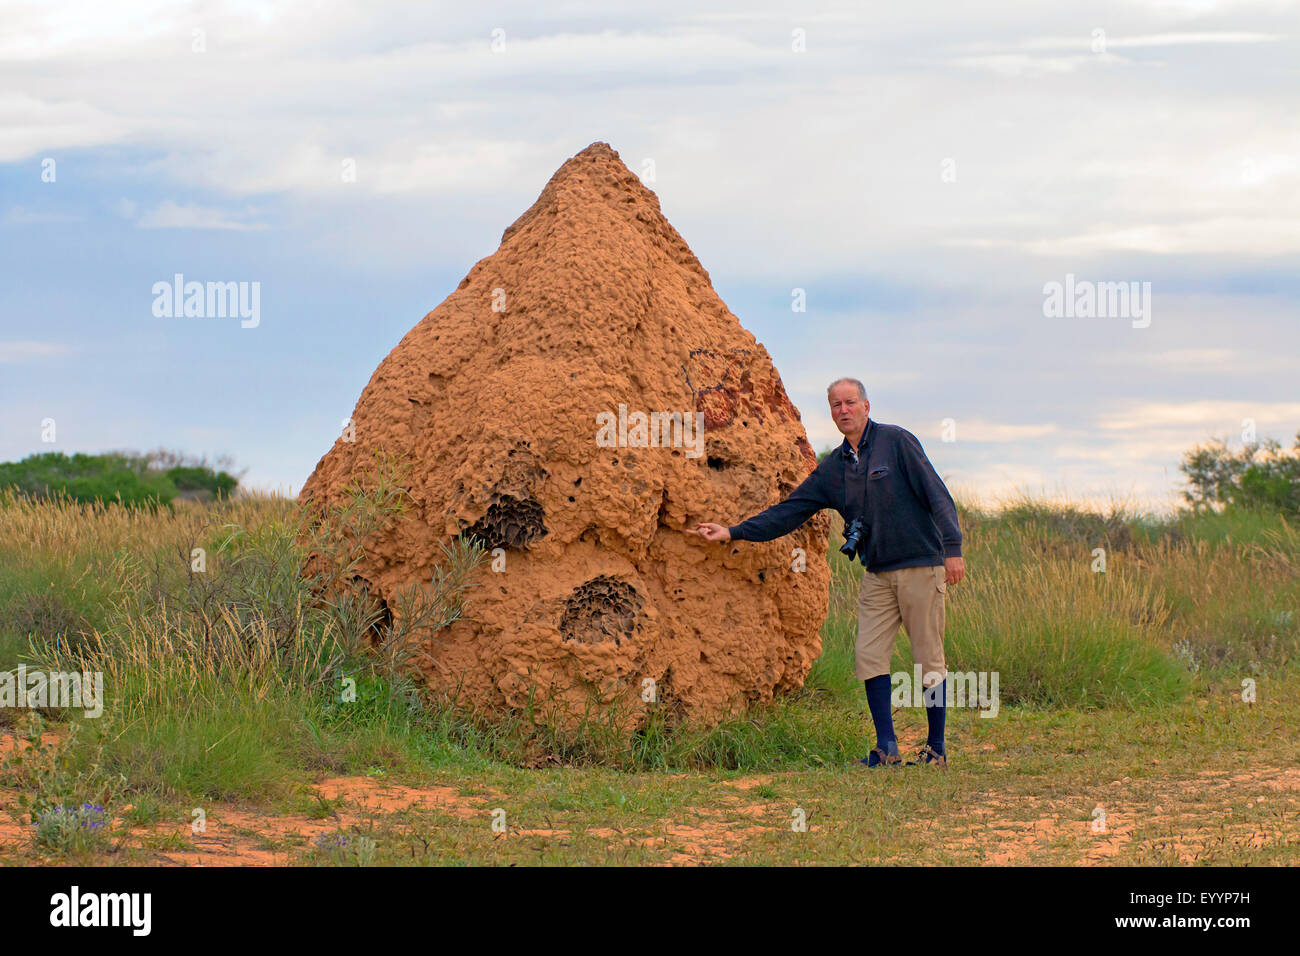 termite hill with a human for scale comparison, Australia, Western Australia, Cardabia - Stock Image